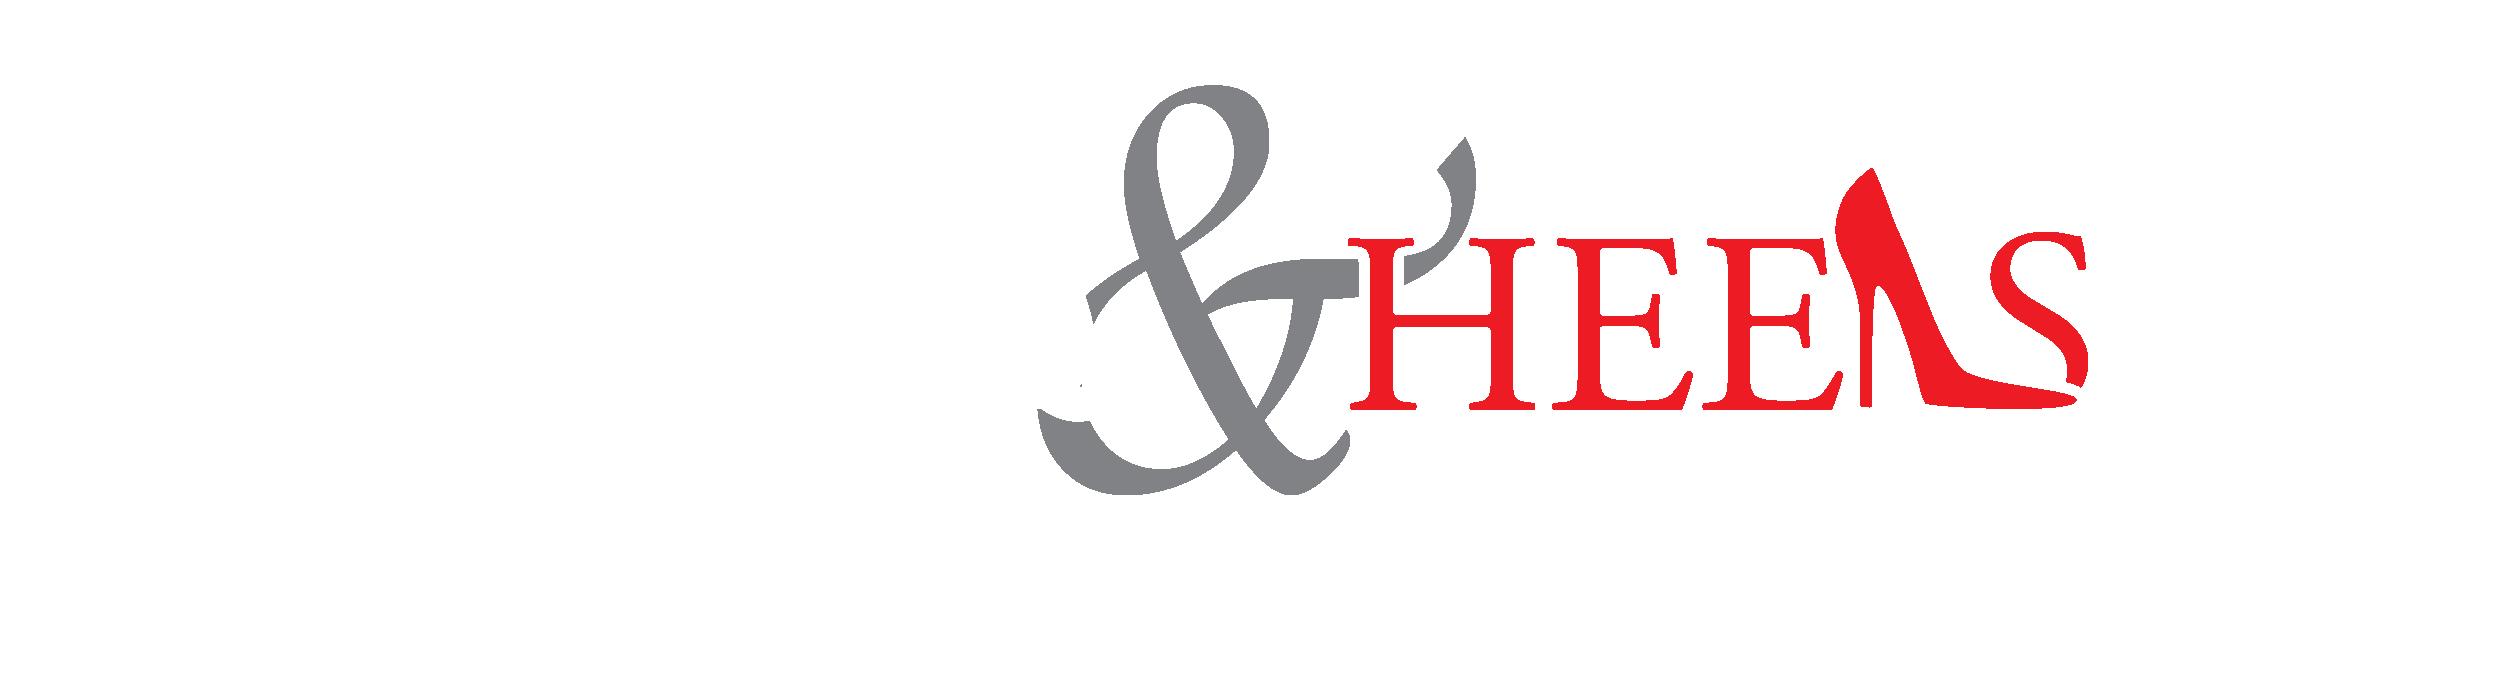 2016_W&H_Logo_Horizontal_Reverse